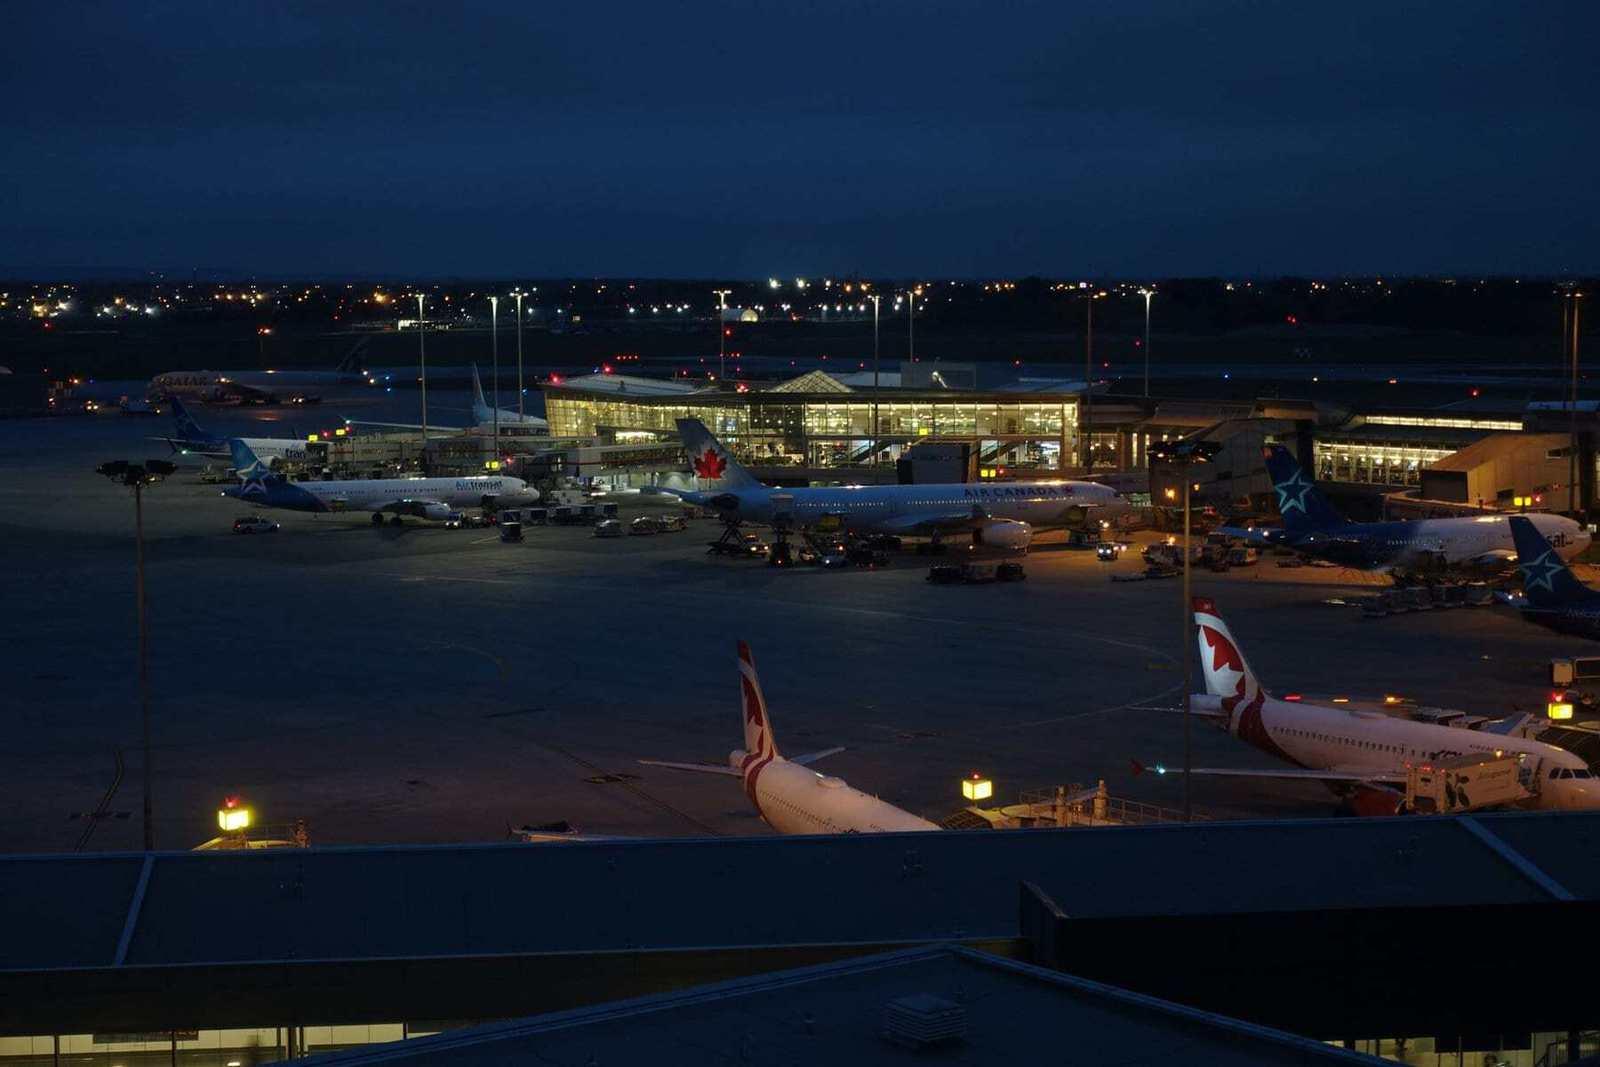 marriott terminal aeroport montreal yul 17